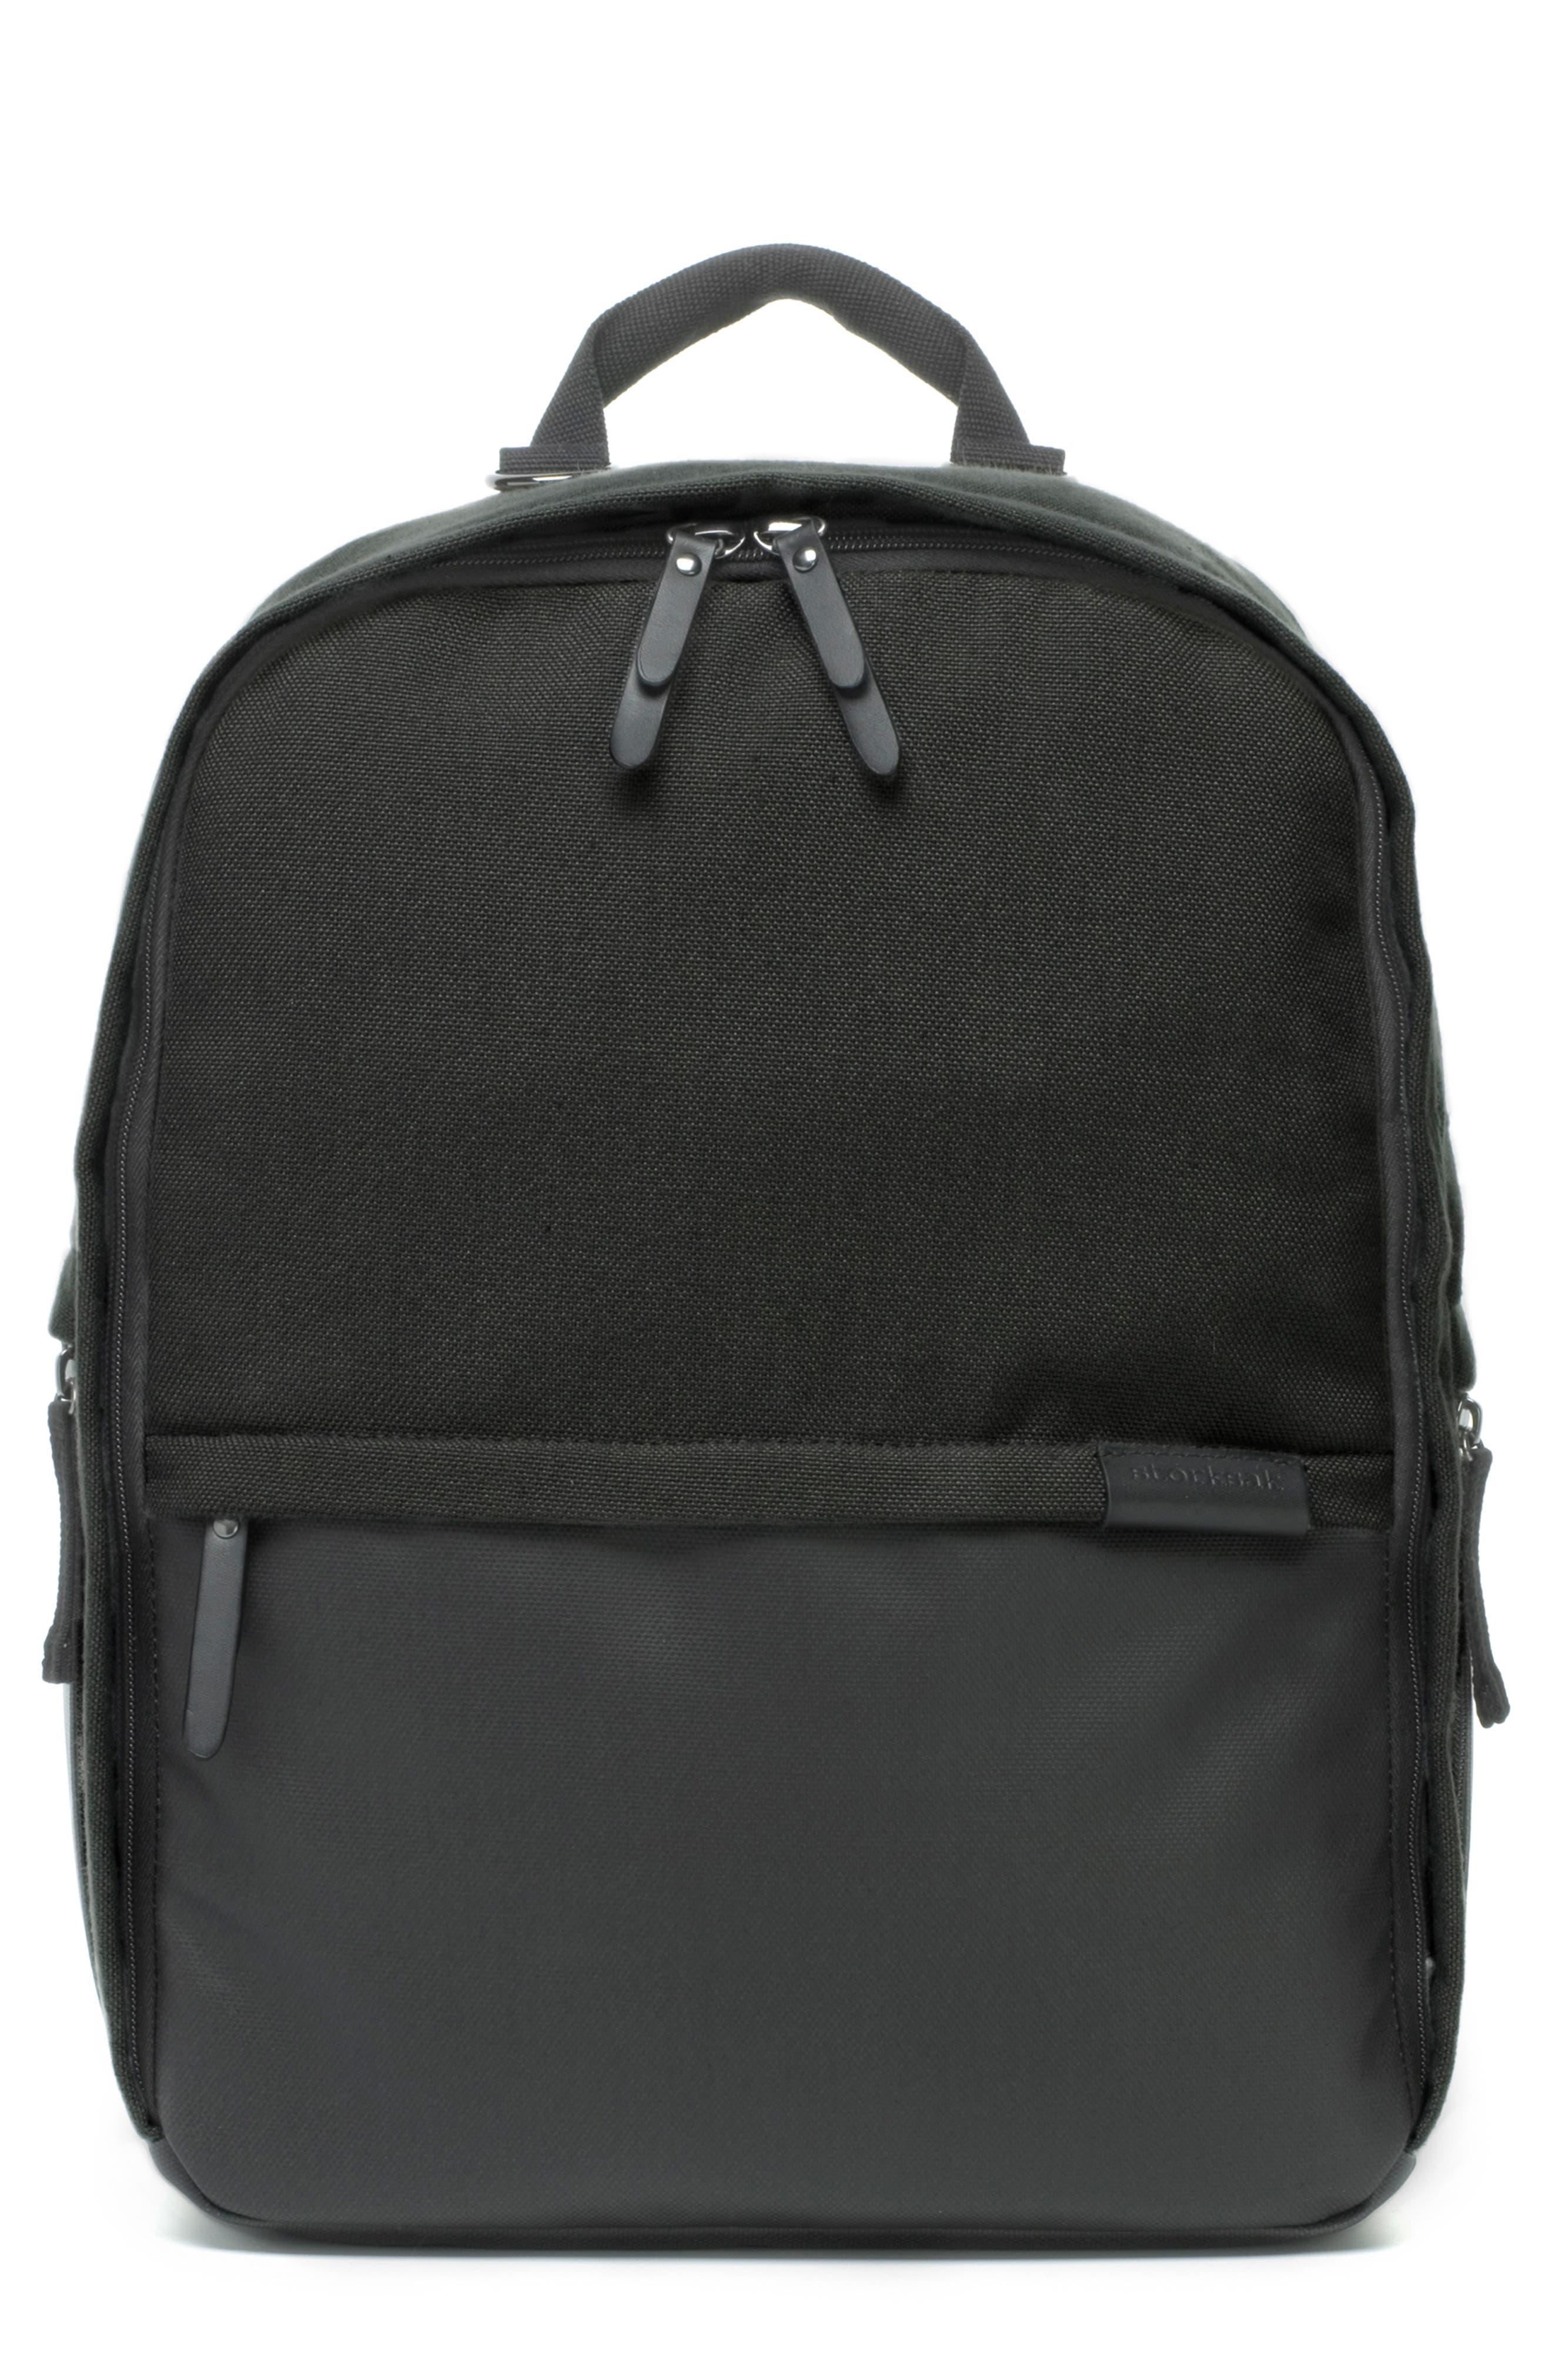 Taylor Diaper Backpack,                             Main thumbnail 1, color,                             BLACK